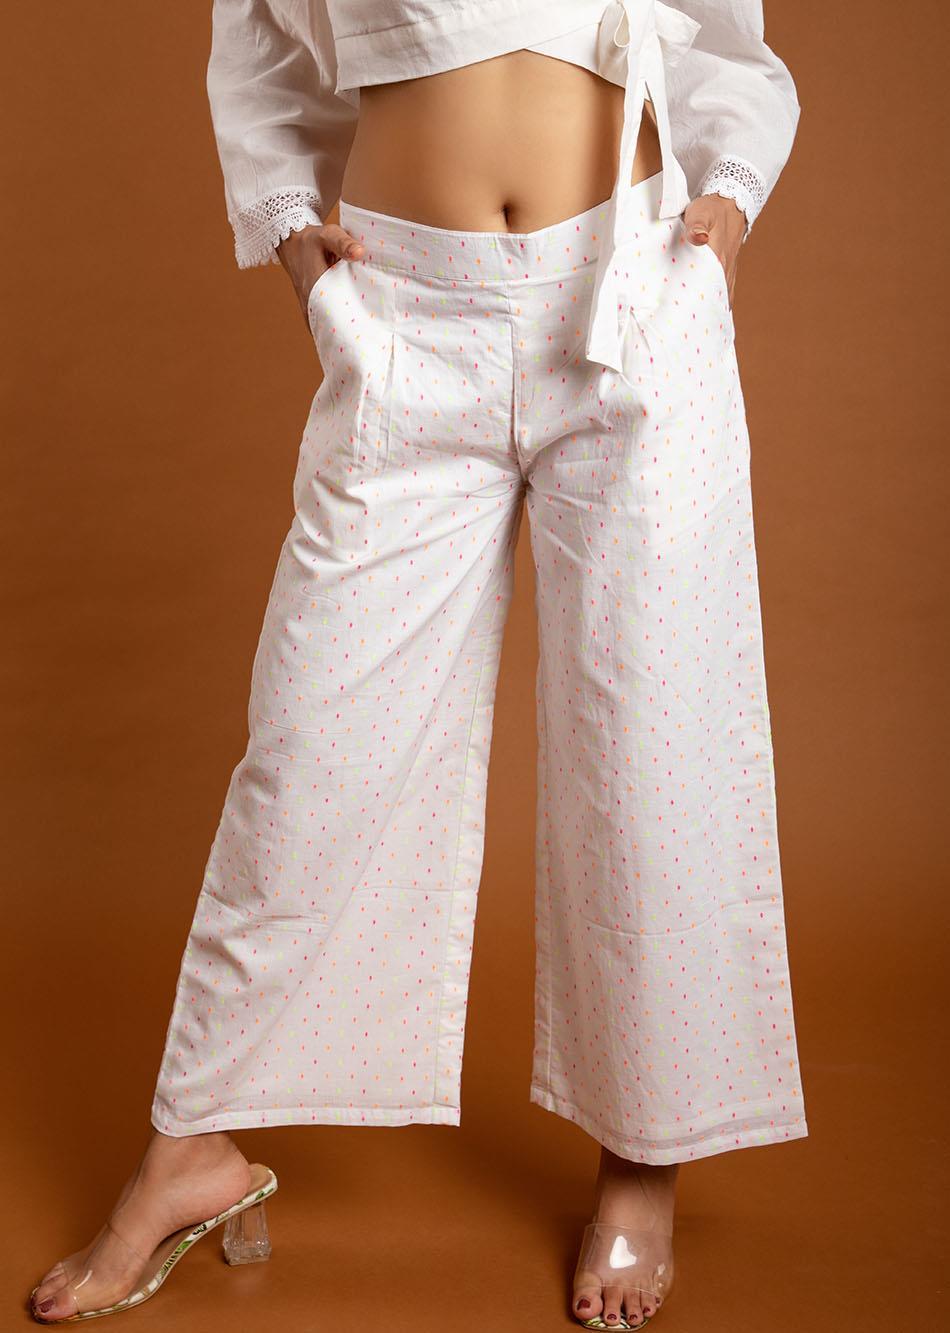 Go Mono (set of 2) By Jovi Fashion